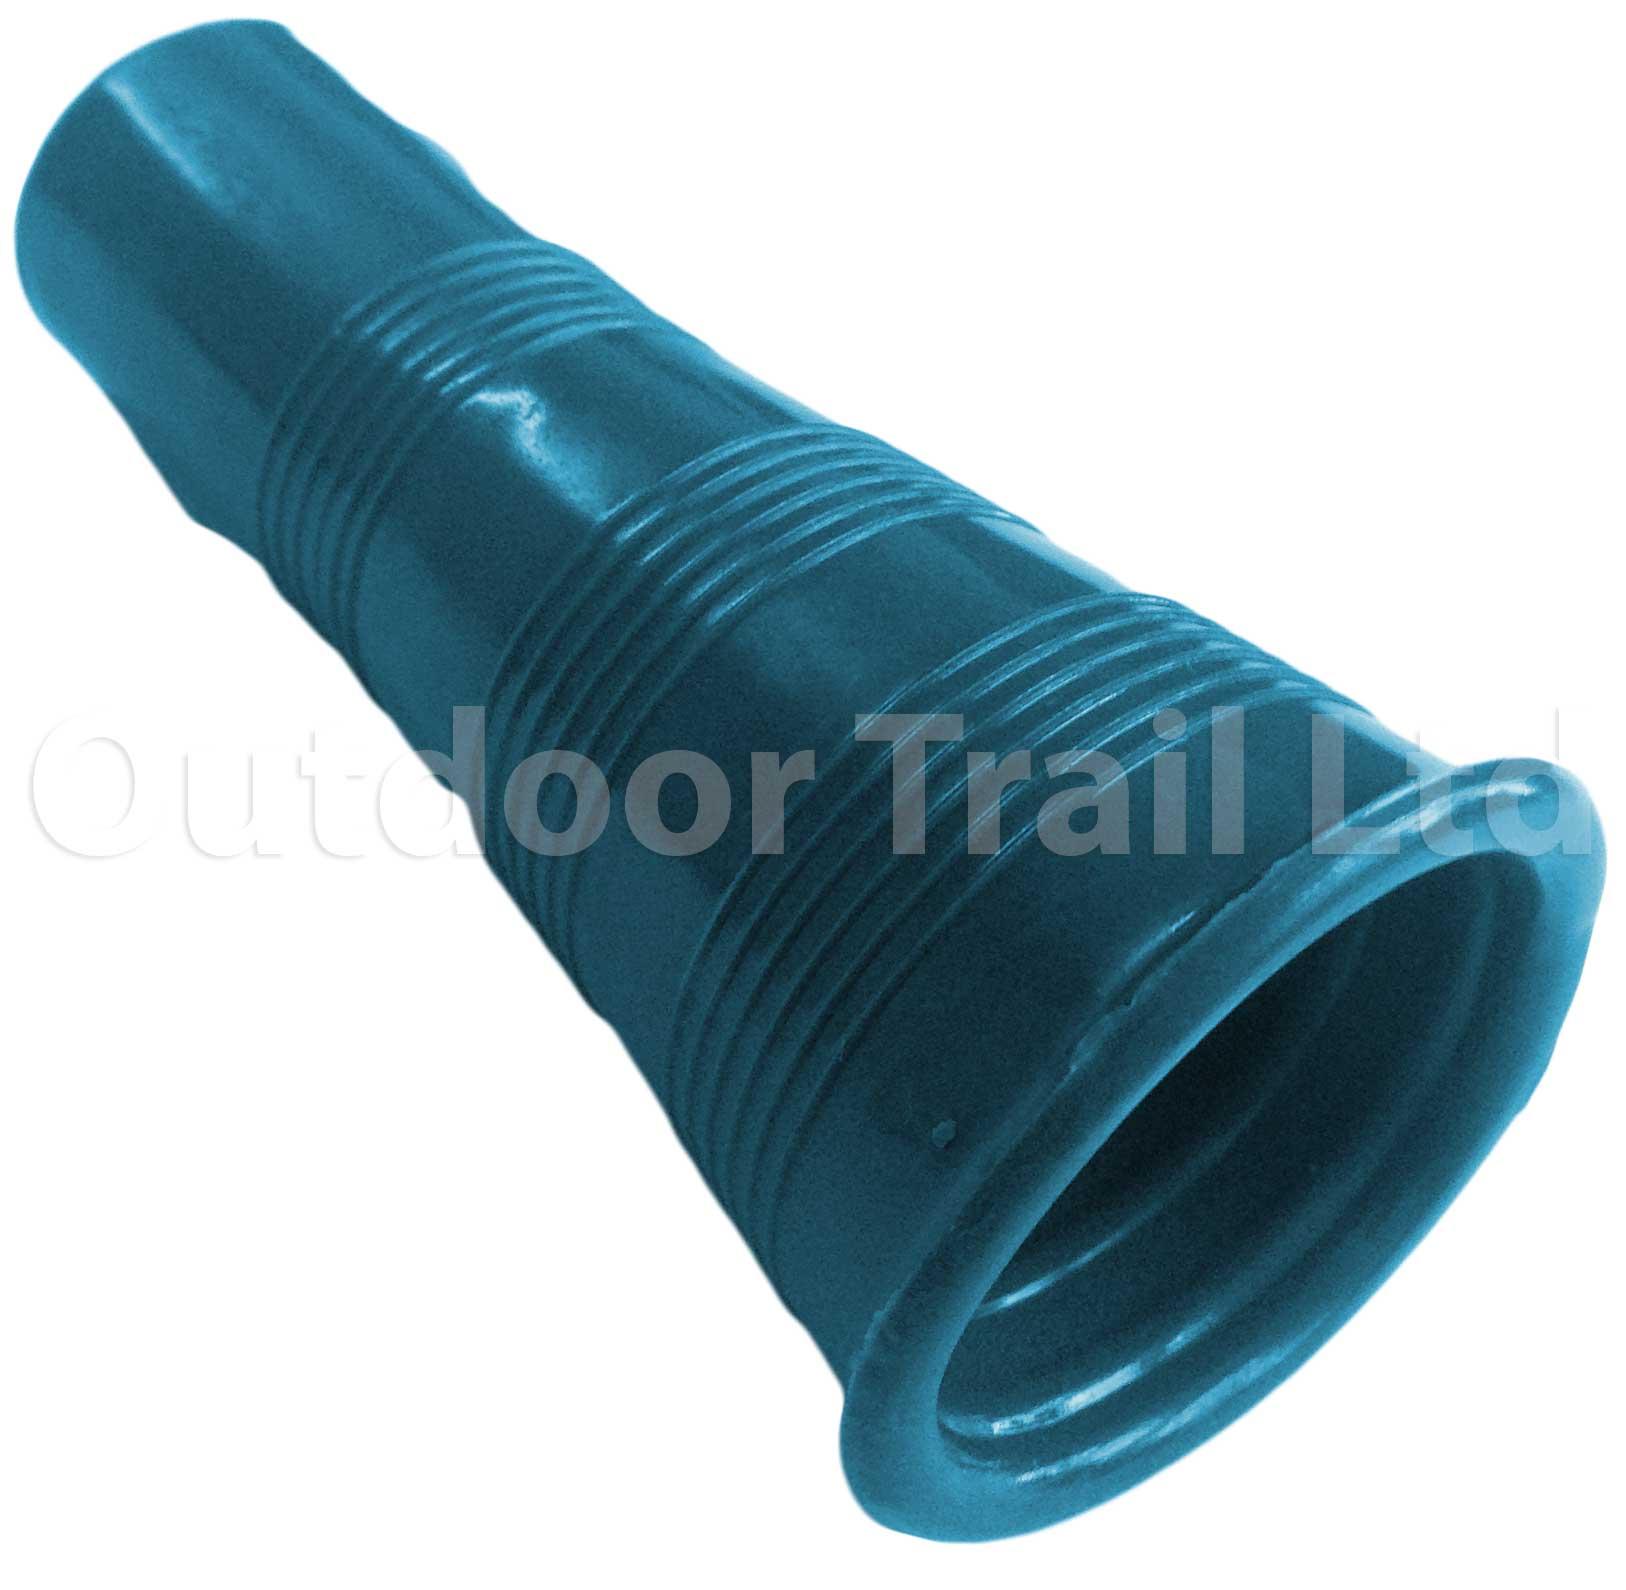 W genuine rubber caravan motorhome universal tap hose